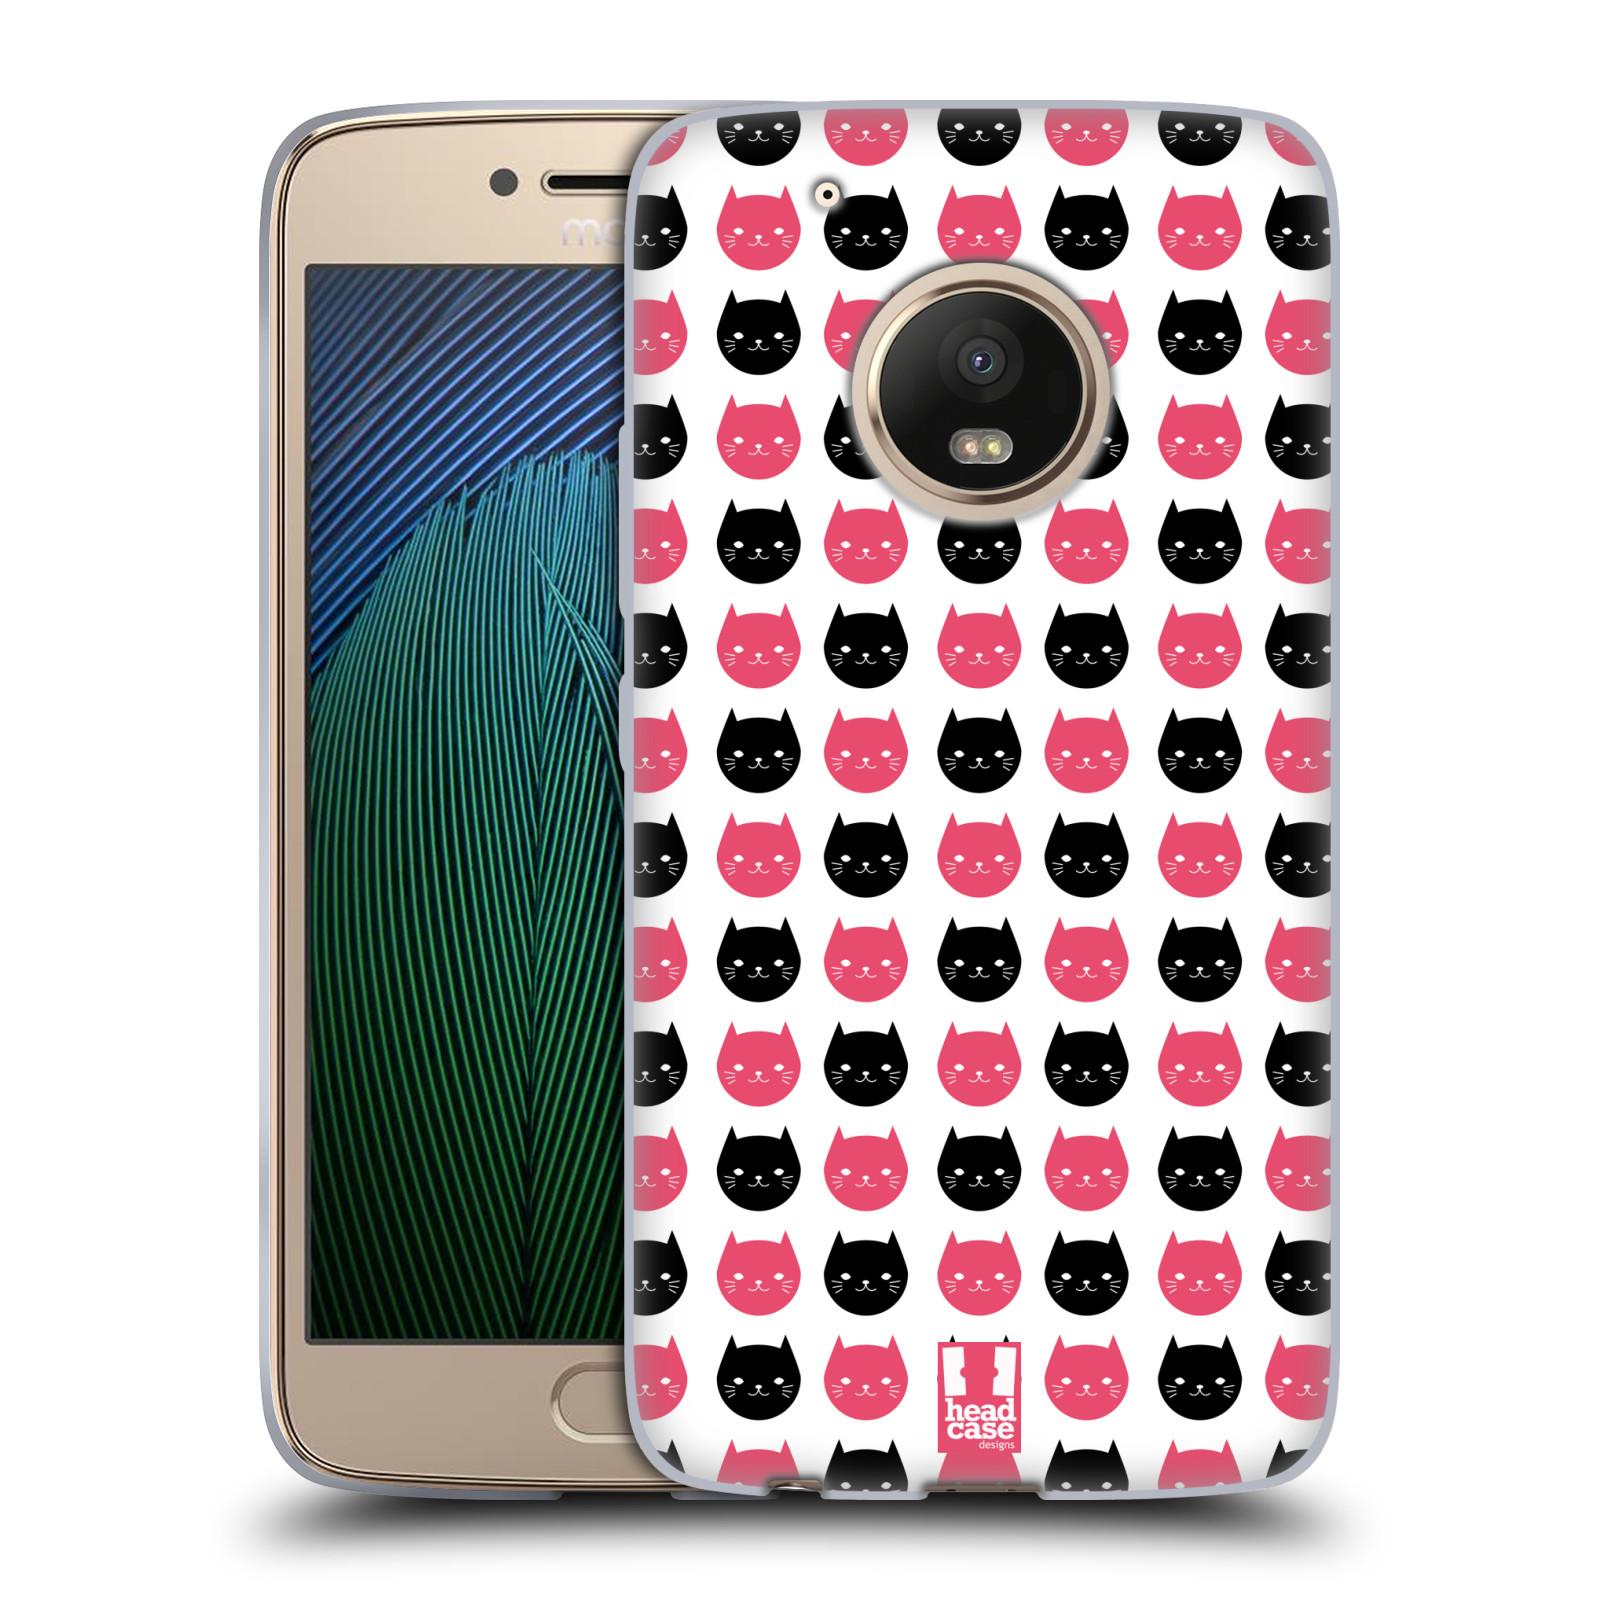 Silikonové pouzdro na mobil Lenovo Moto G5 Plus - Head Case KOČKY Black and Pink (Silikonový kryt či obal na mobilní telefon Lenovo Moto G5 Plus)